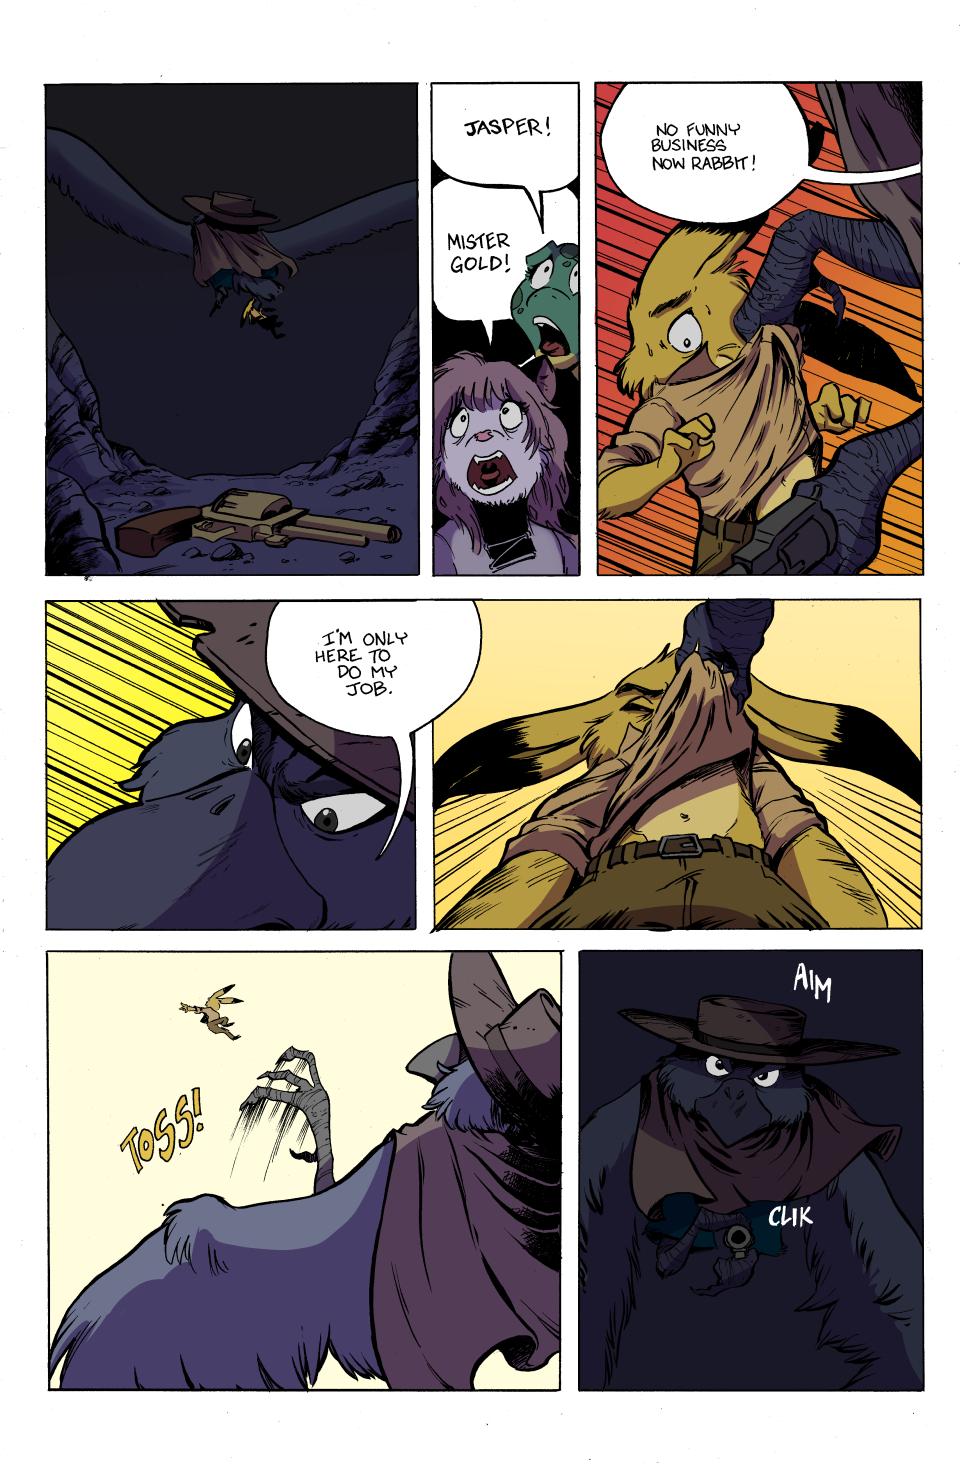 Jasper Gold 04 – Pg. 20